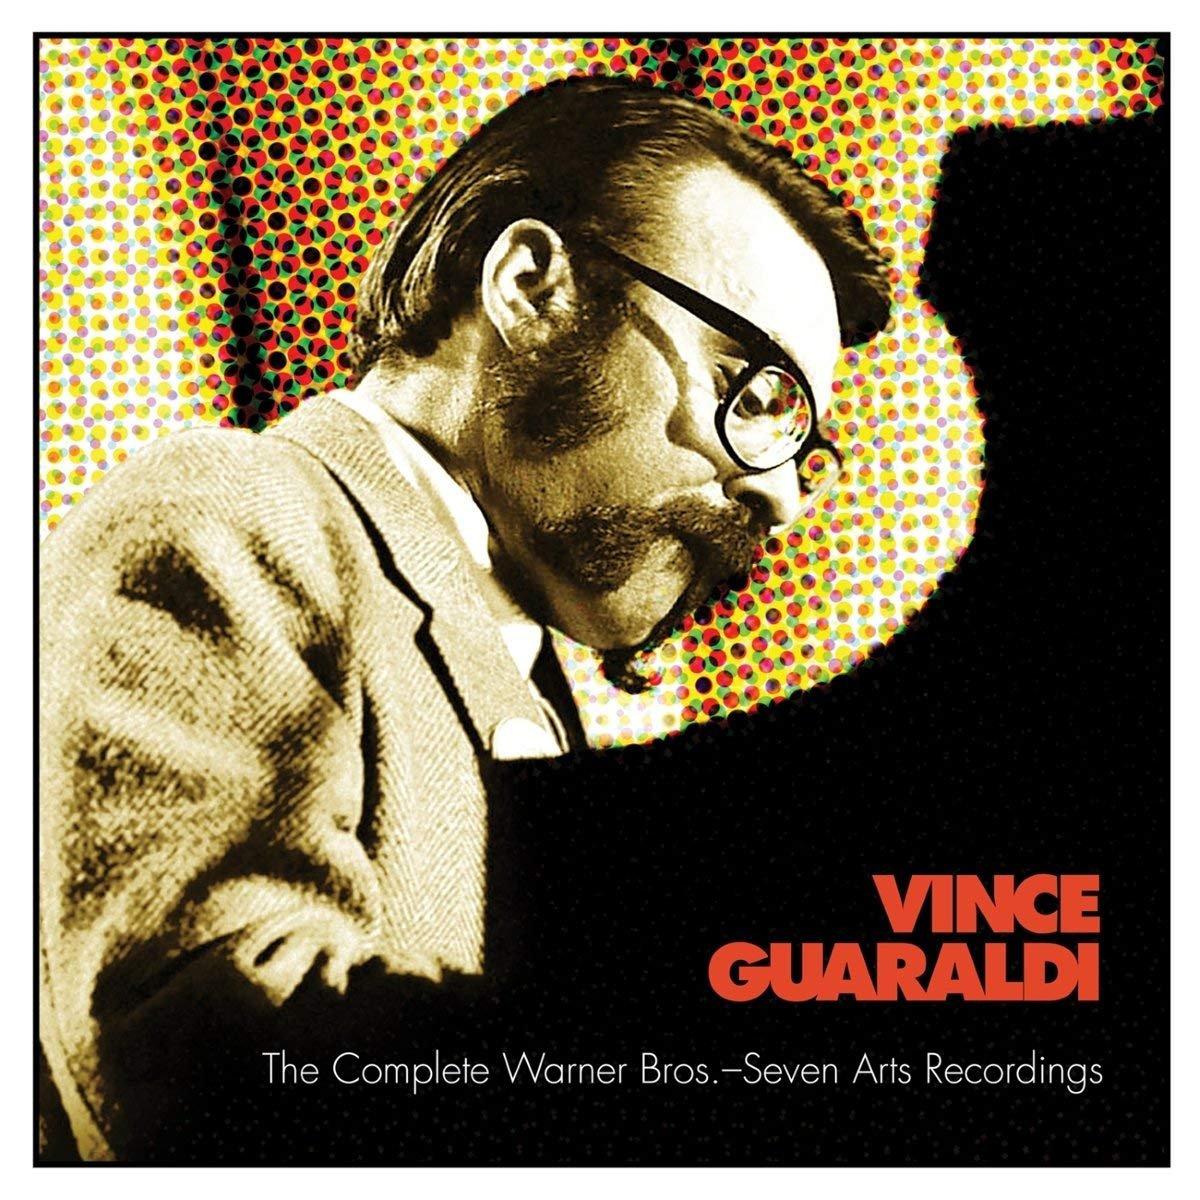 CD : Vince Guaraldi - Complete Warner Bros.-seven Arts Recordings (2PC)